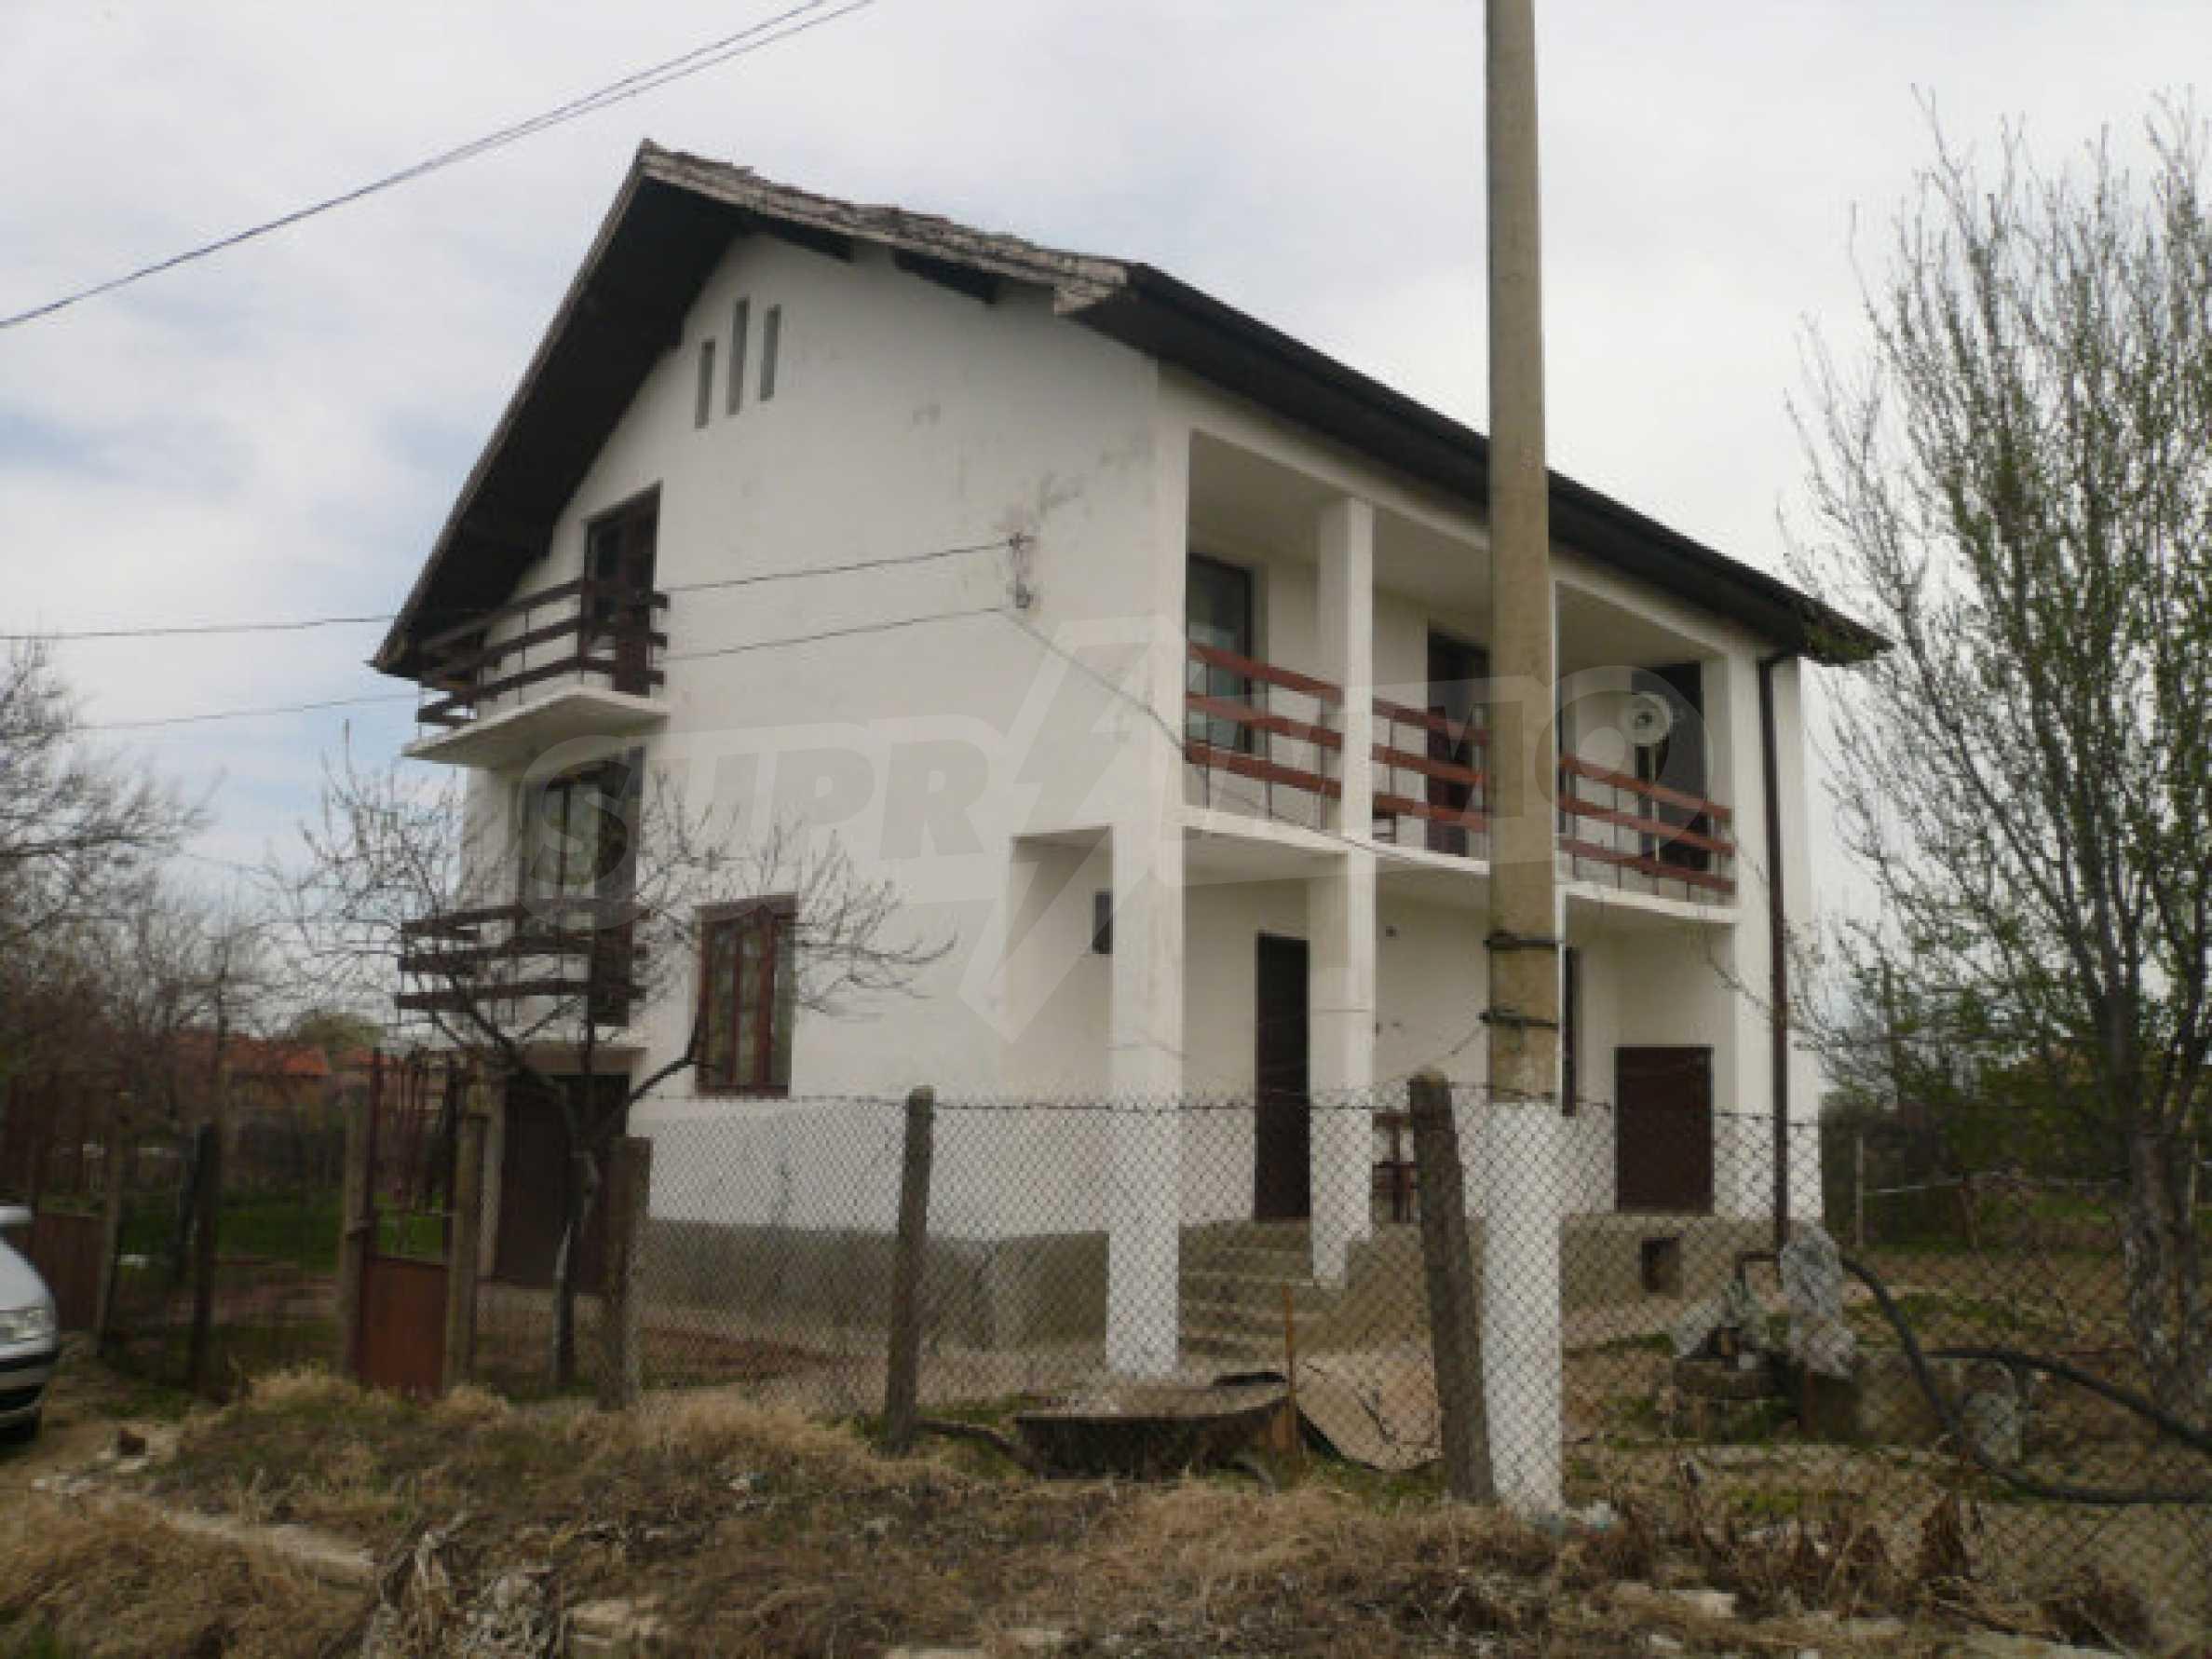 House near Vidin